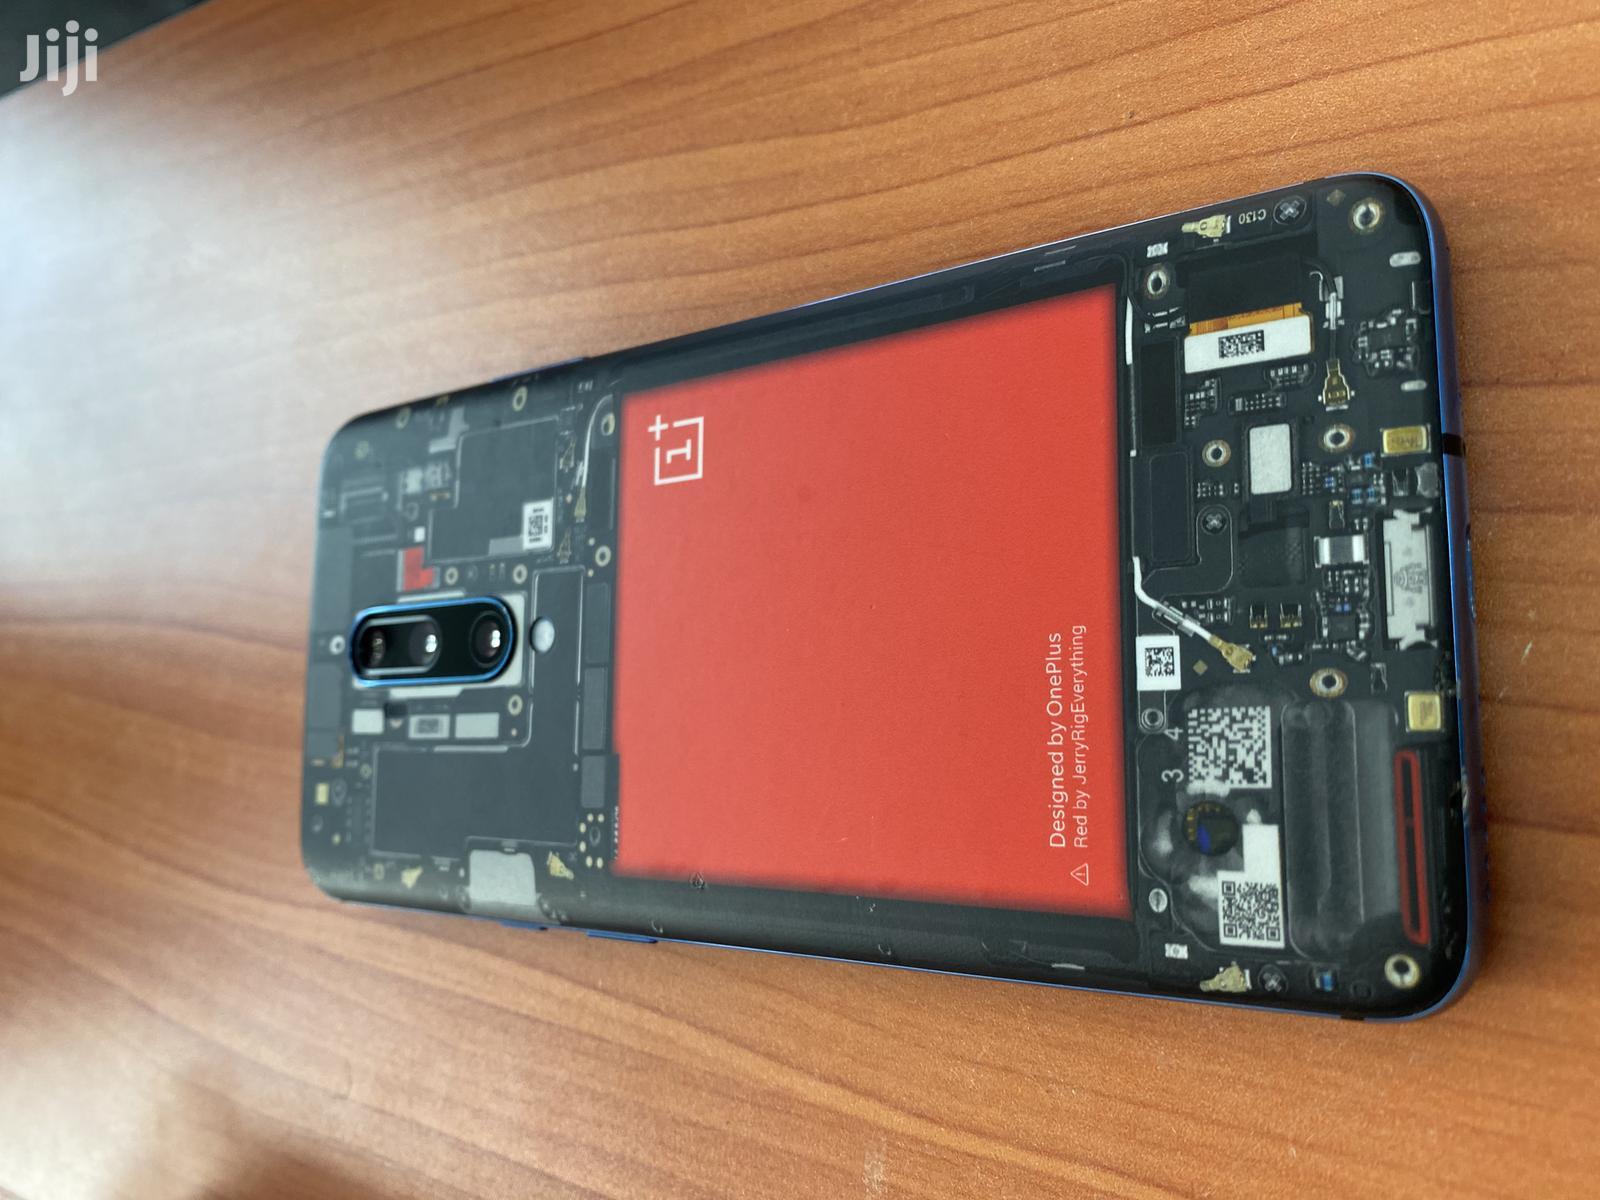 OnePlus 7T Pro 256 GB Black | Mobile Phones for sale in Nairobi Central, Nairobi, Kenya